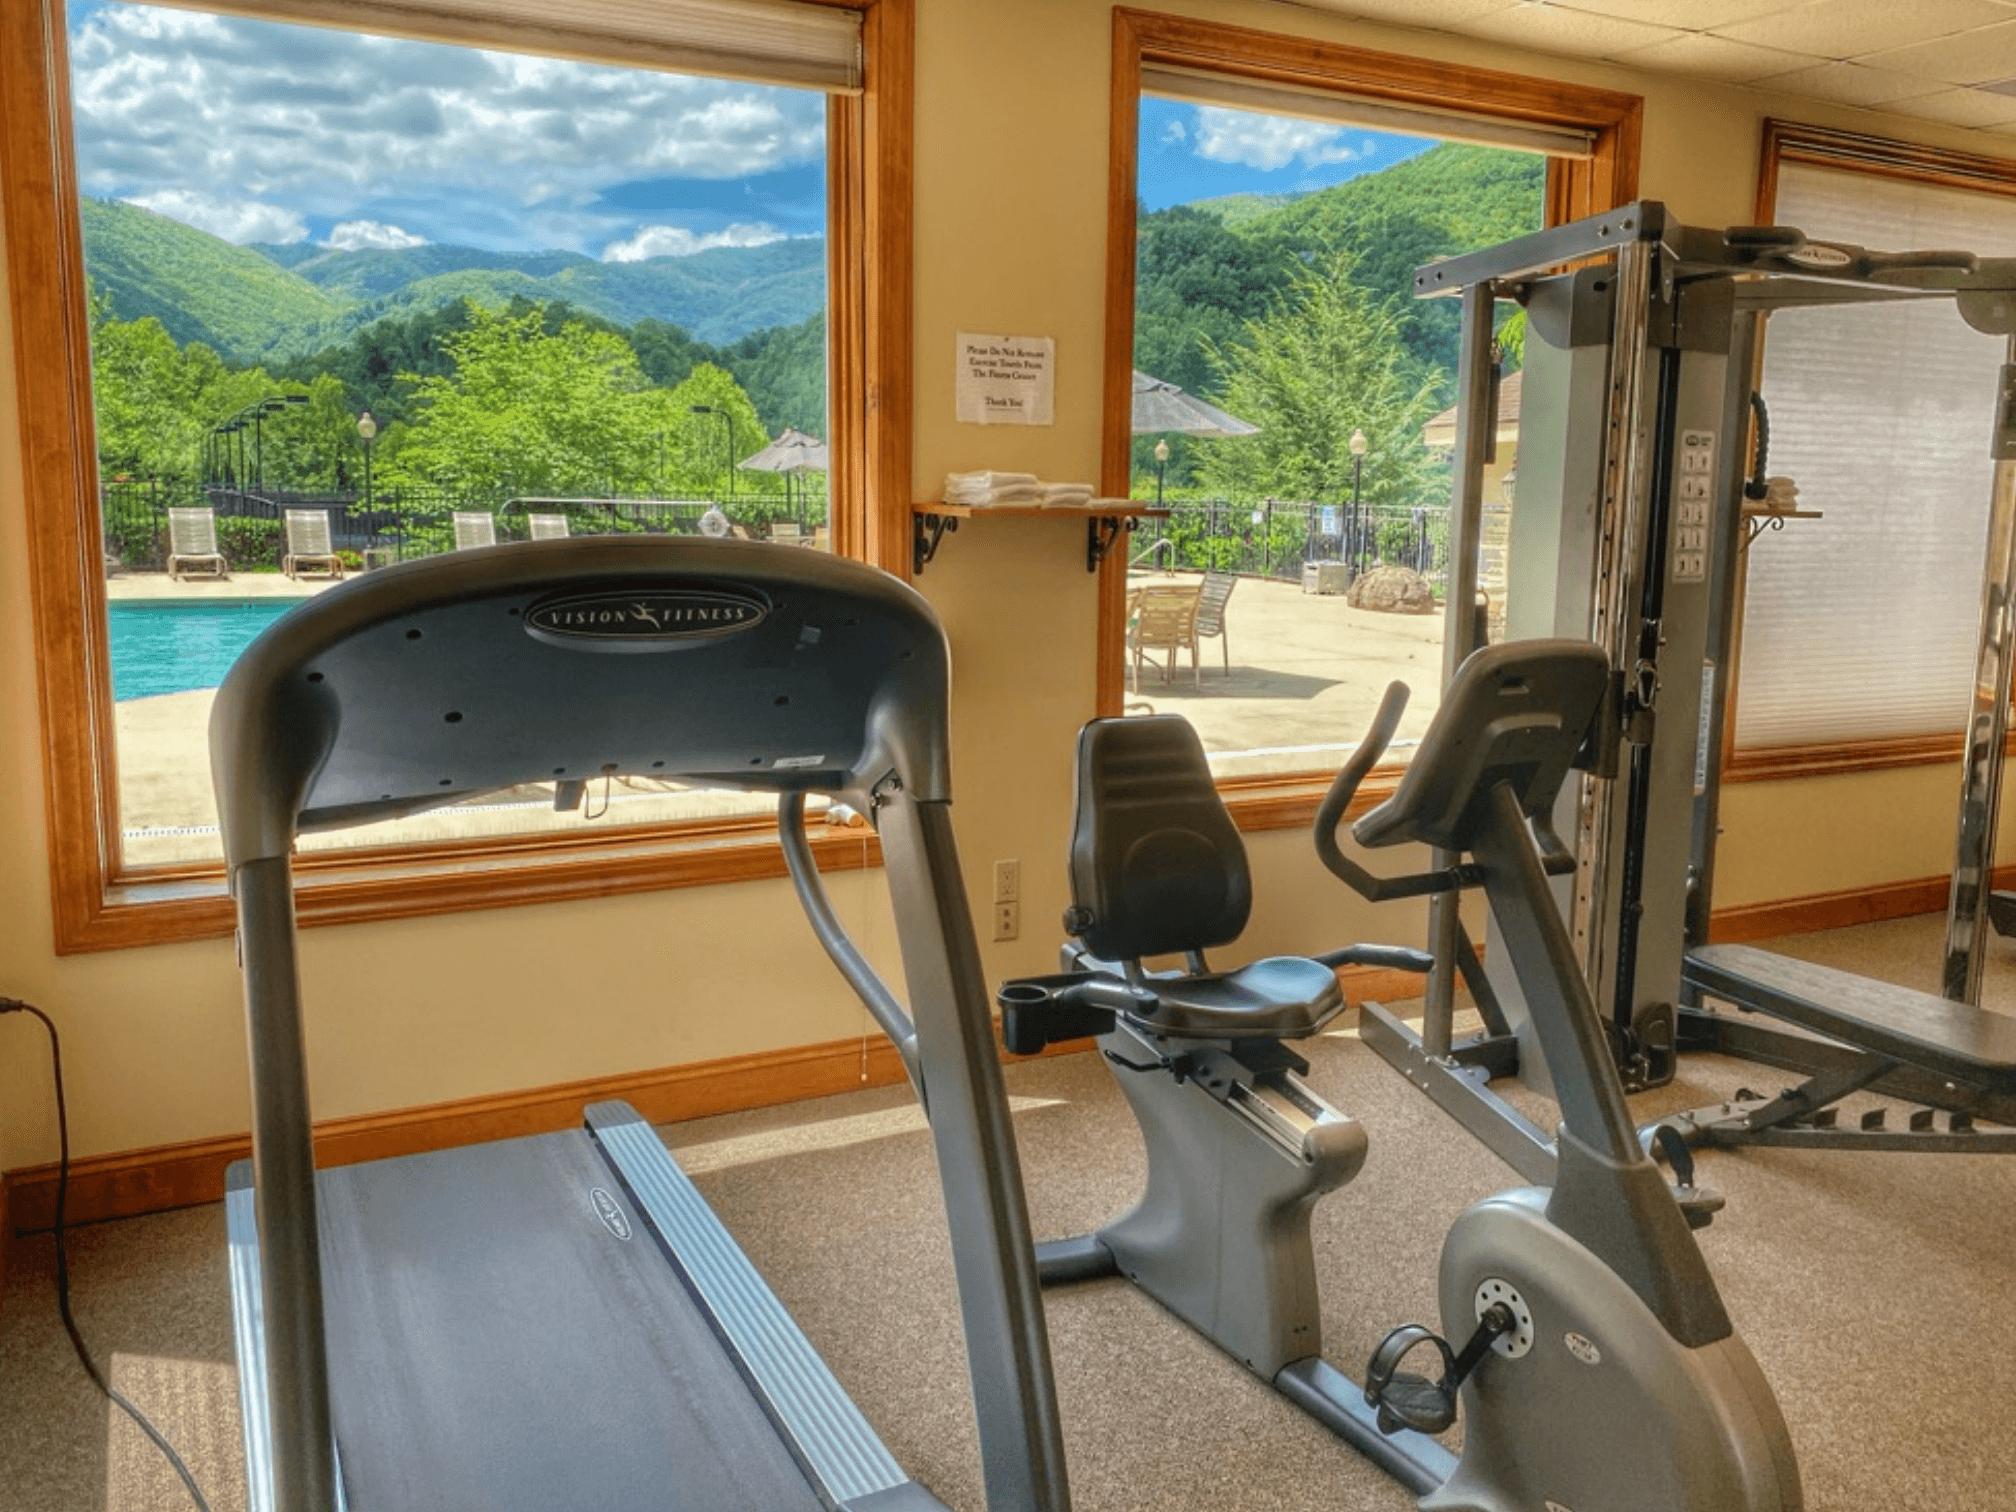 Smoky Mountain Country Club FItness Room